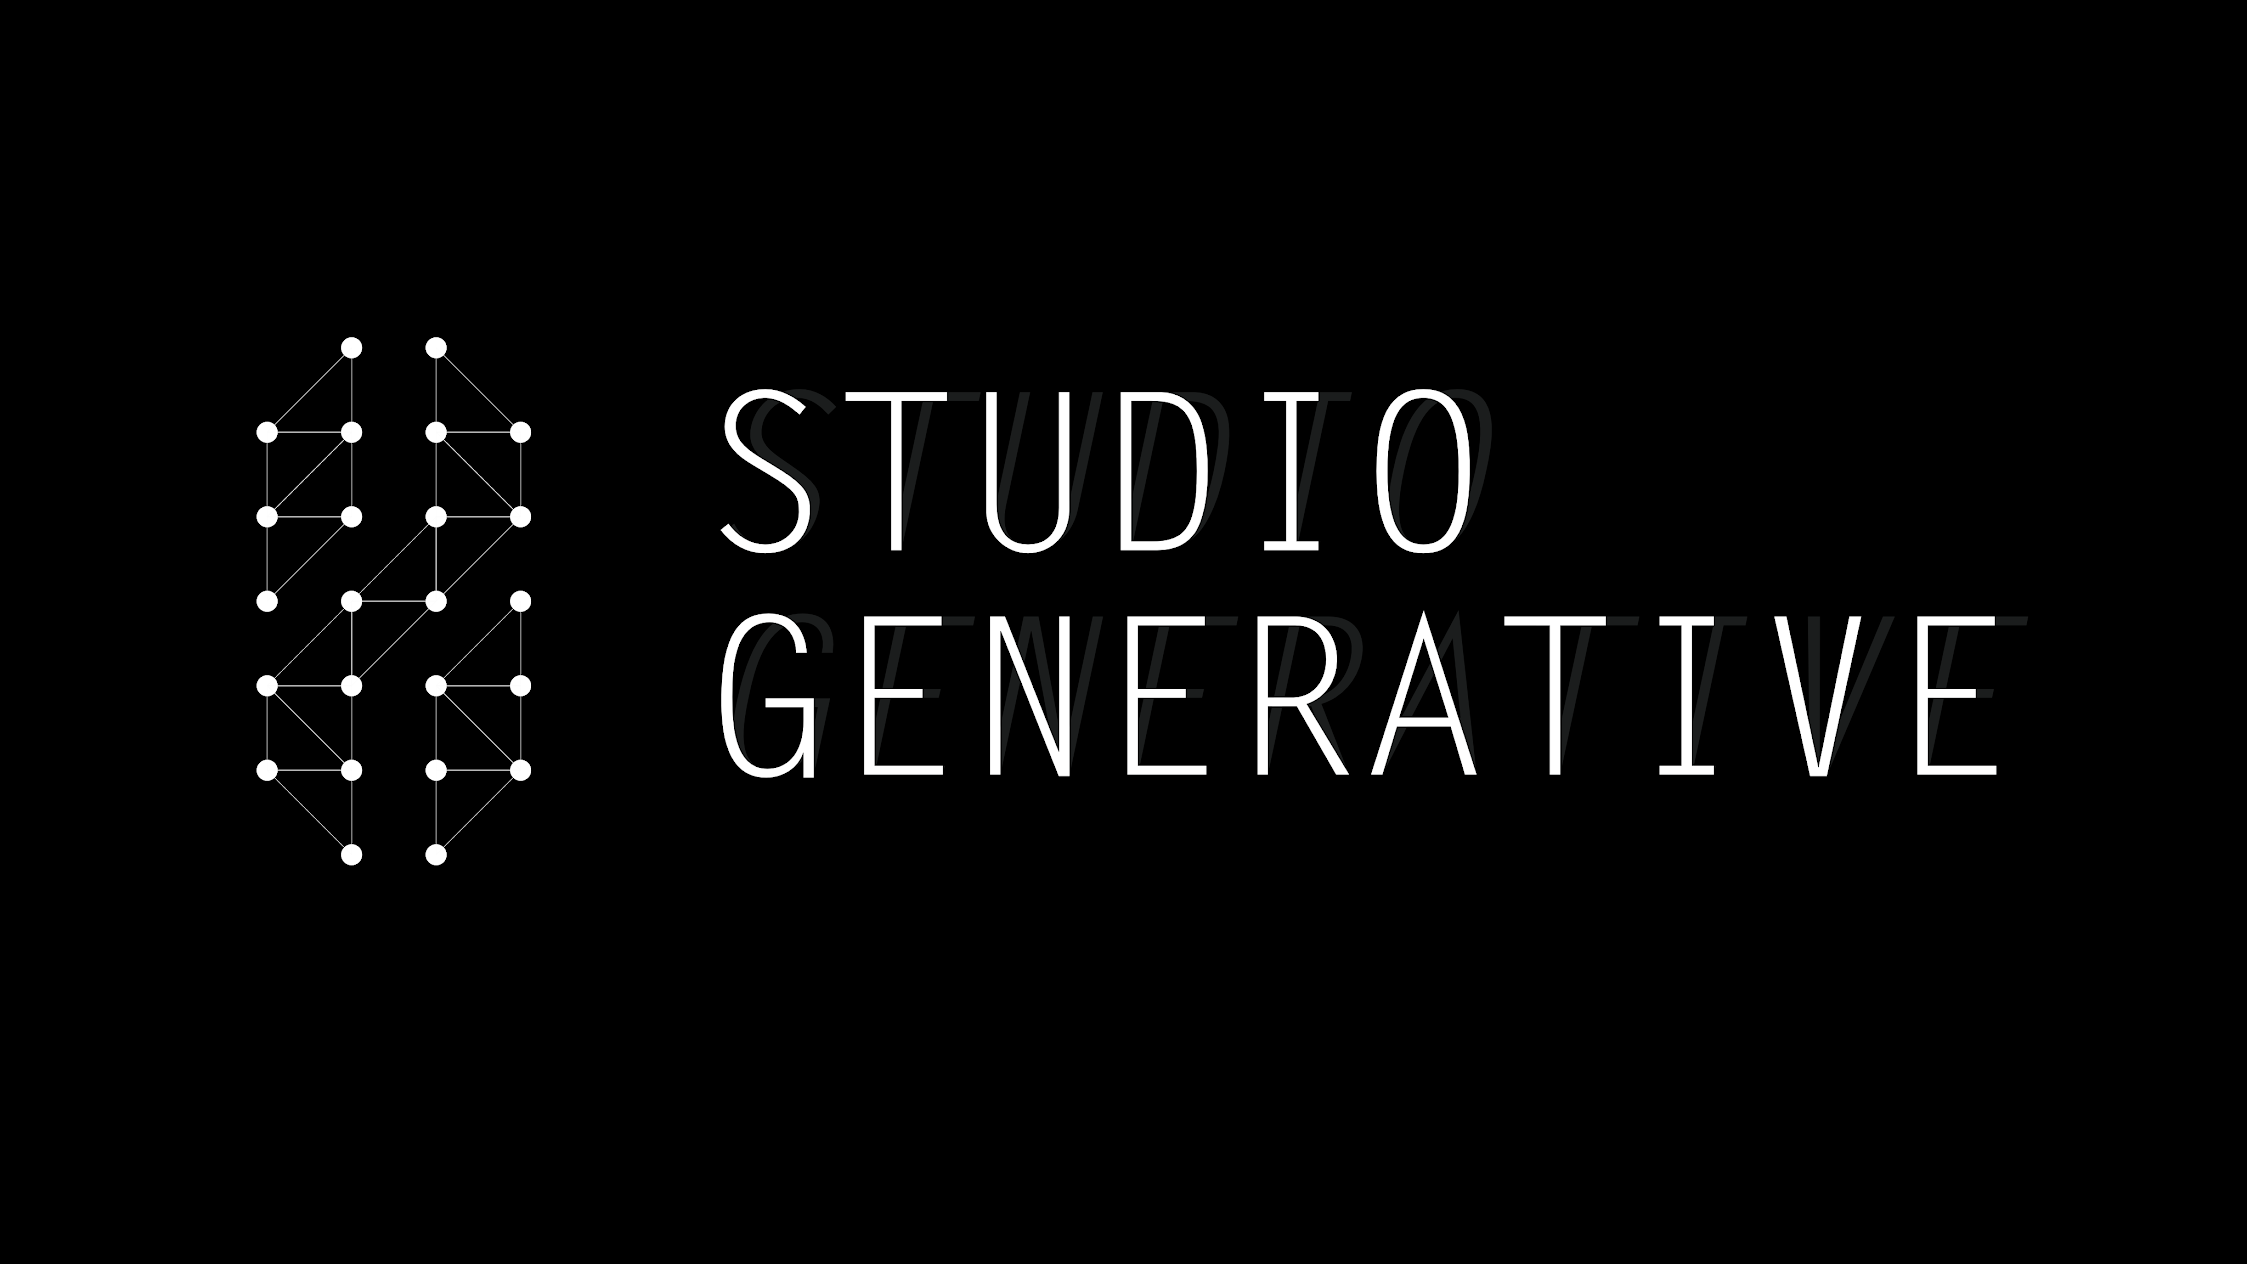 Studio Generative